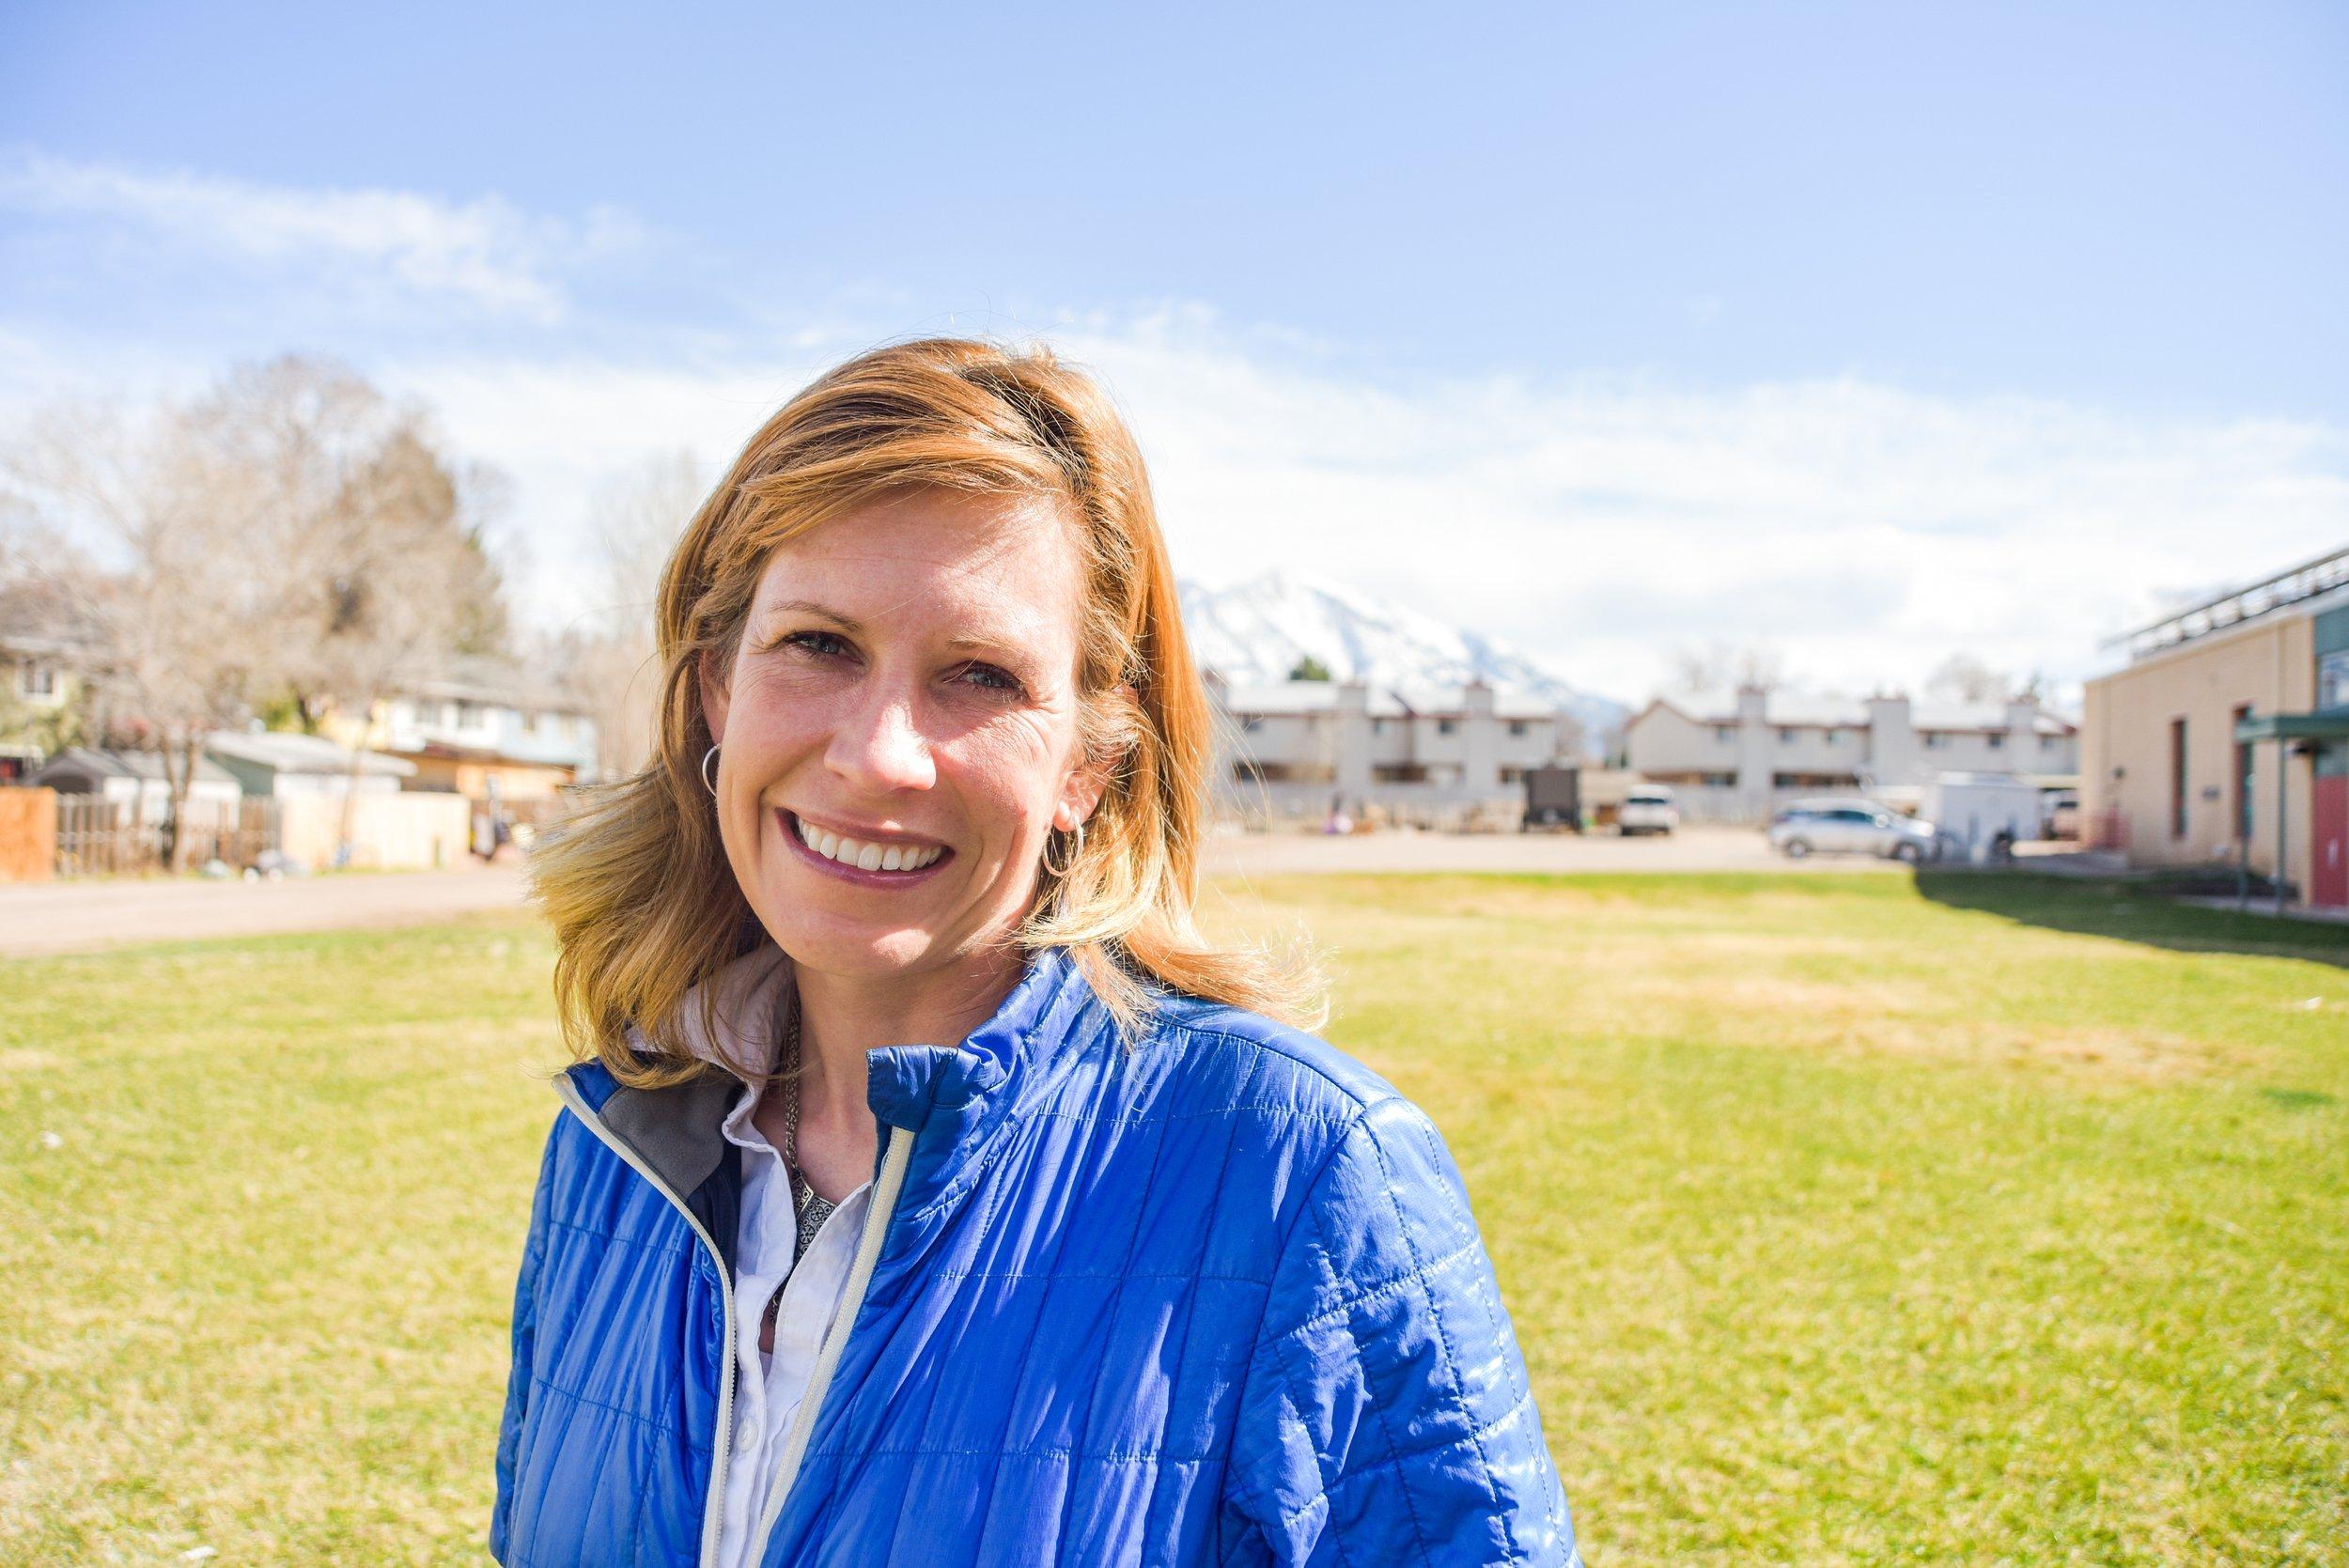 Meet Megan Baiardo, RFHS's next principal thumbnail